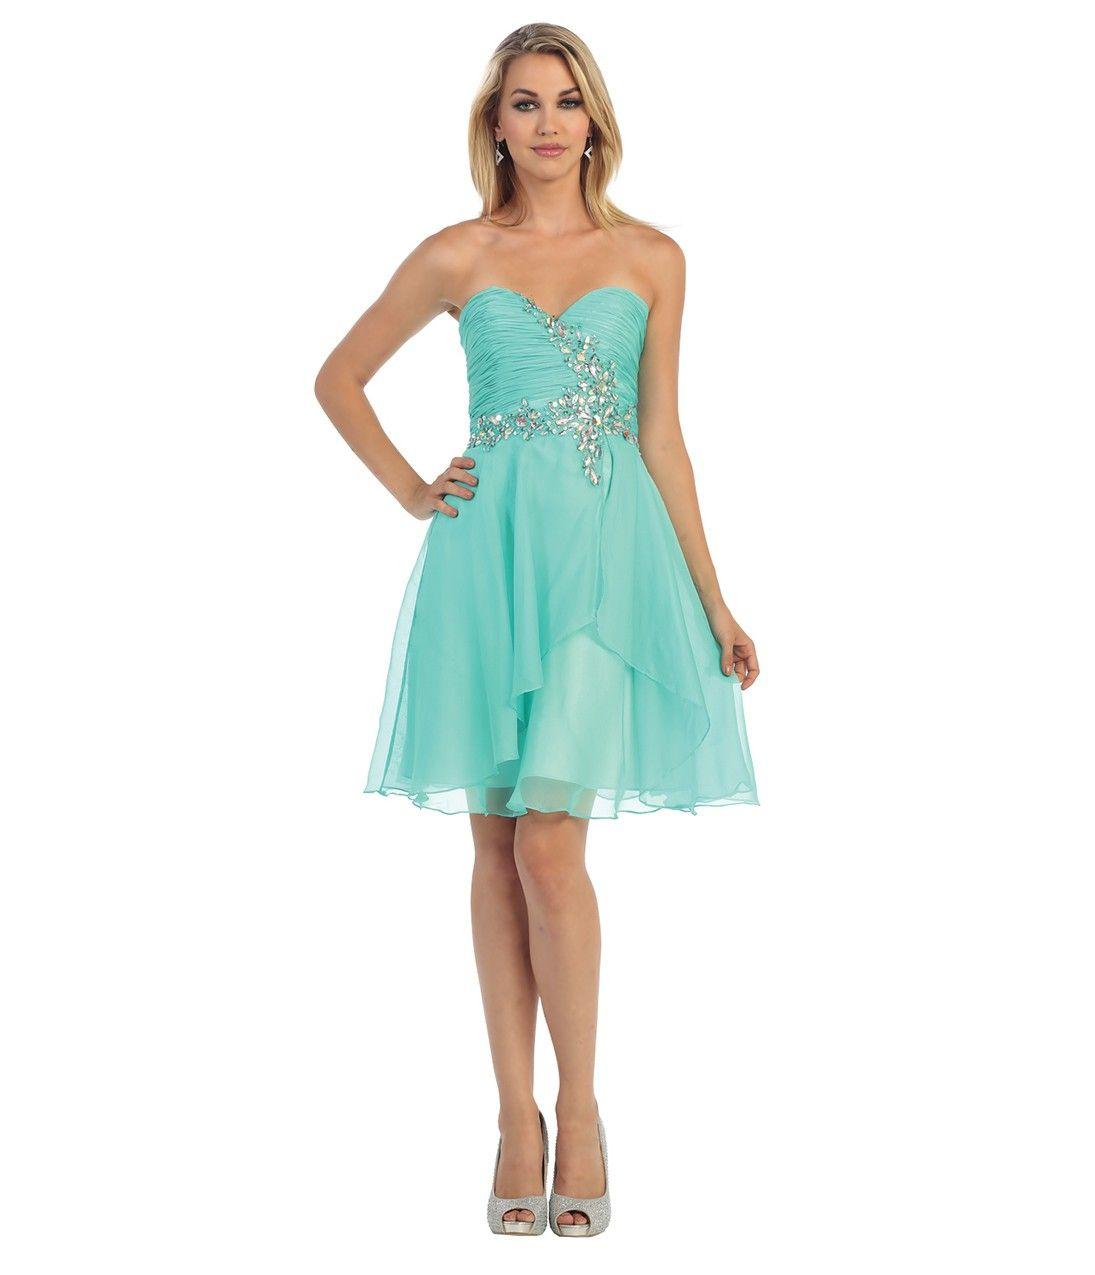 Green chiffon pleated embellished strapless sweetheart short dress